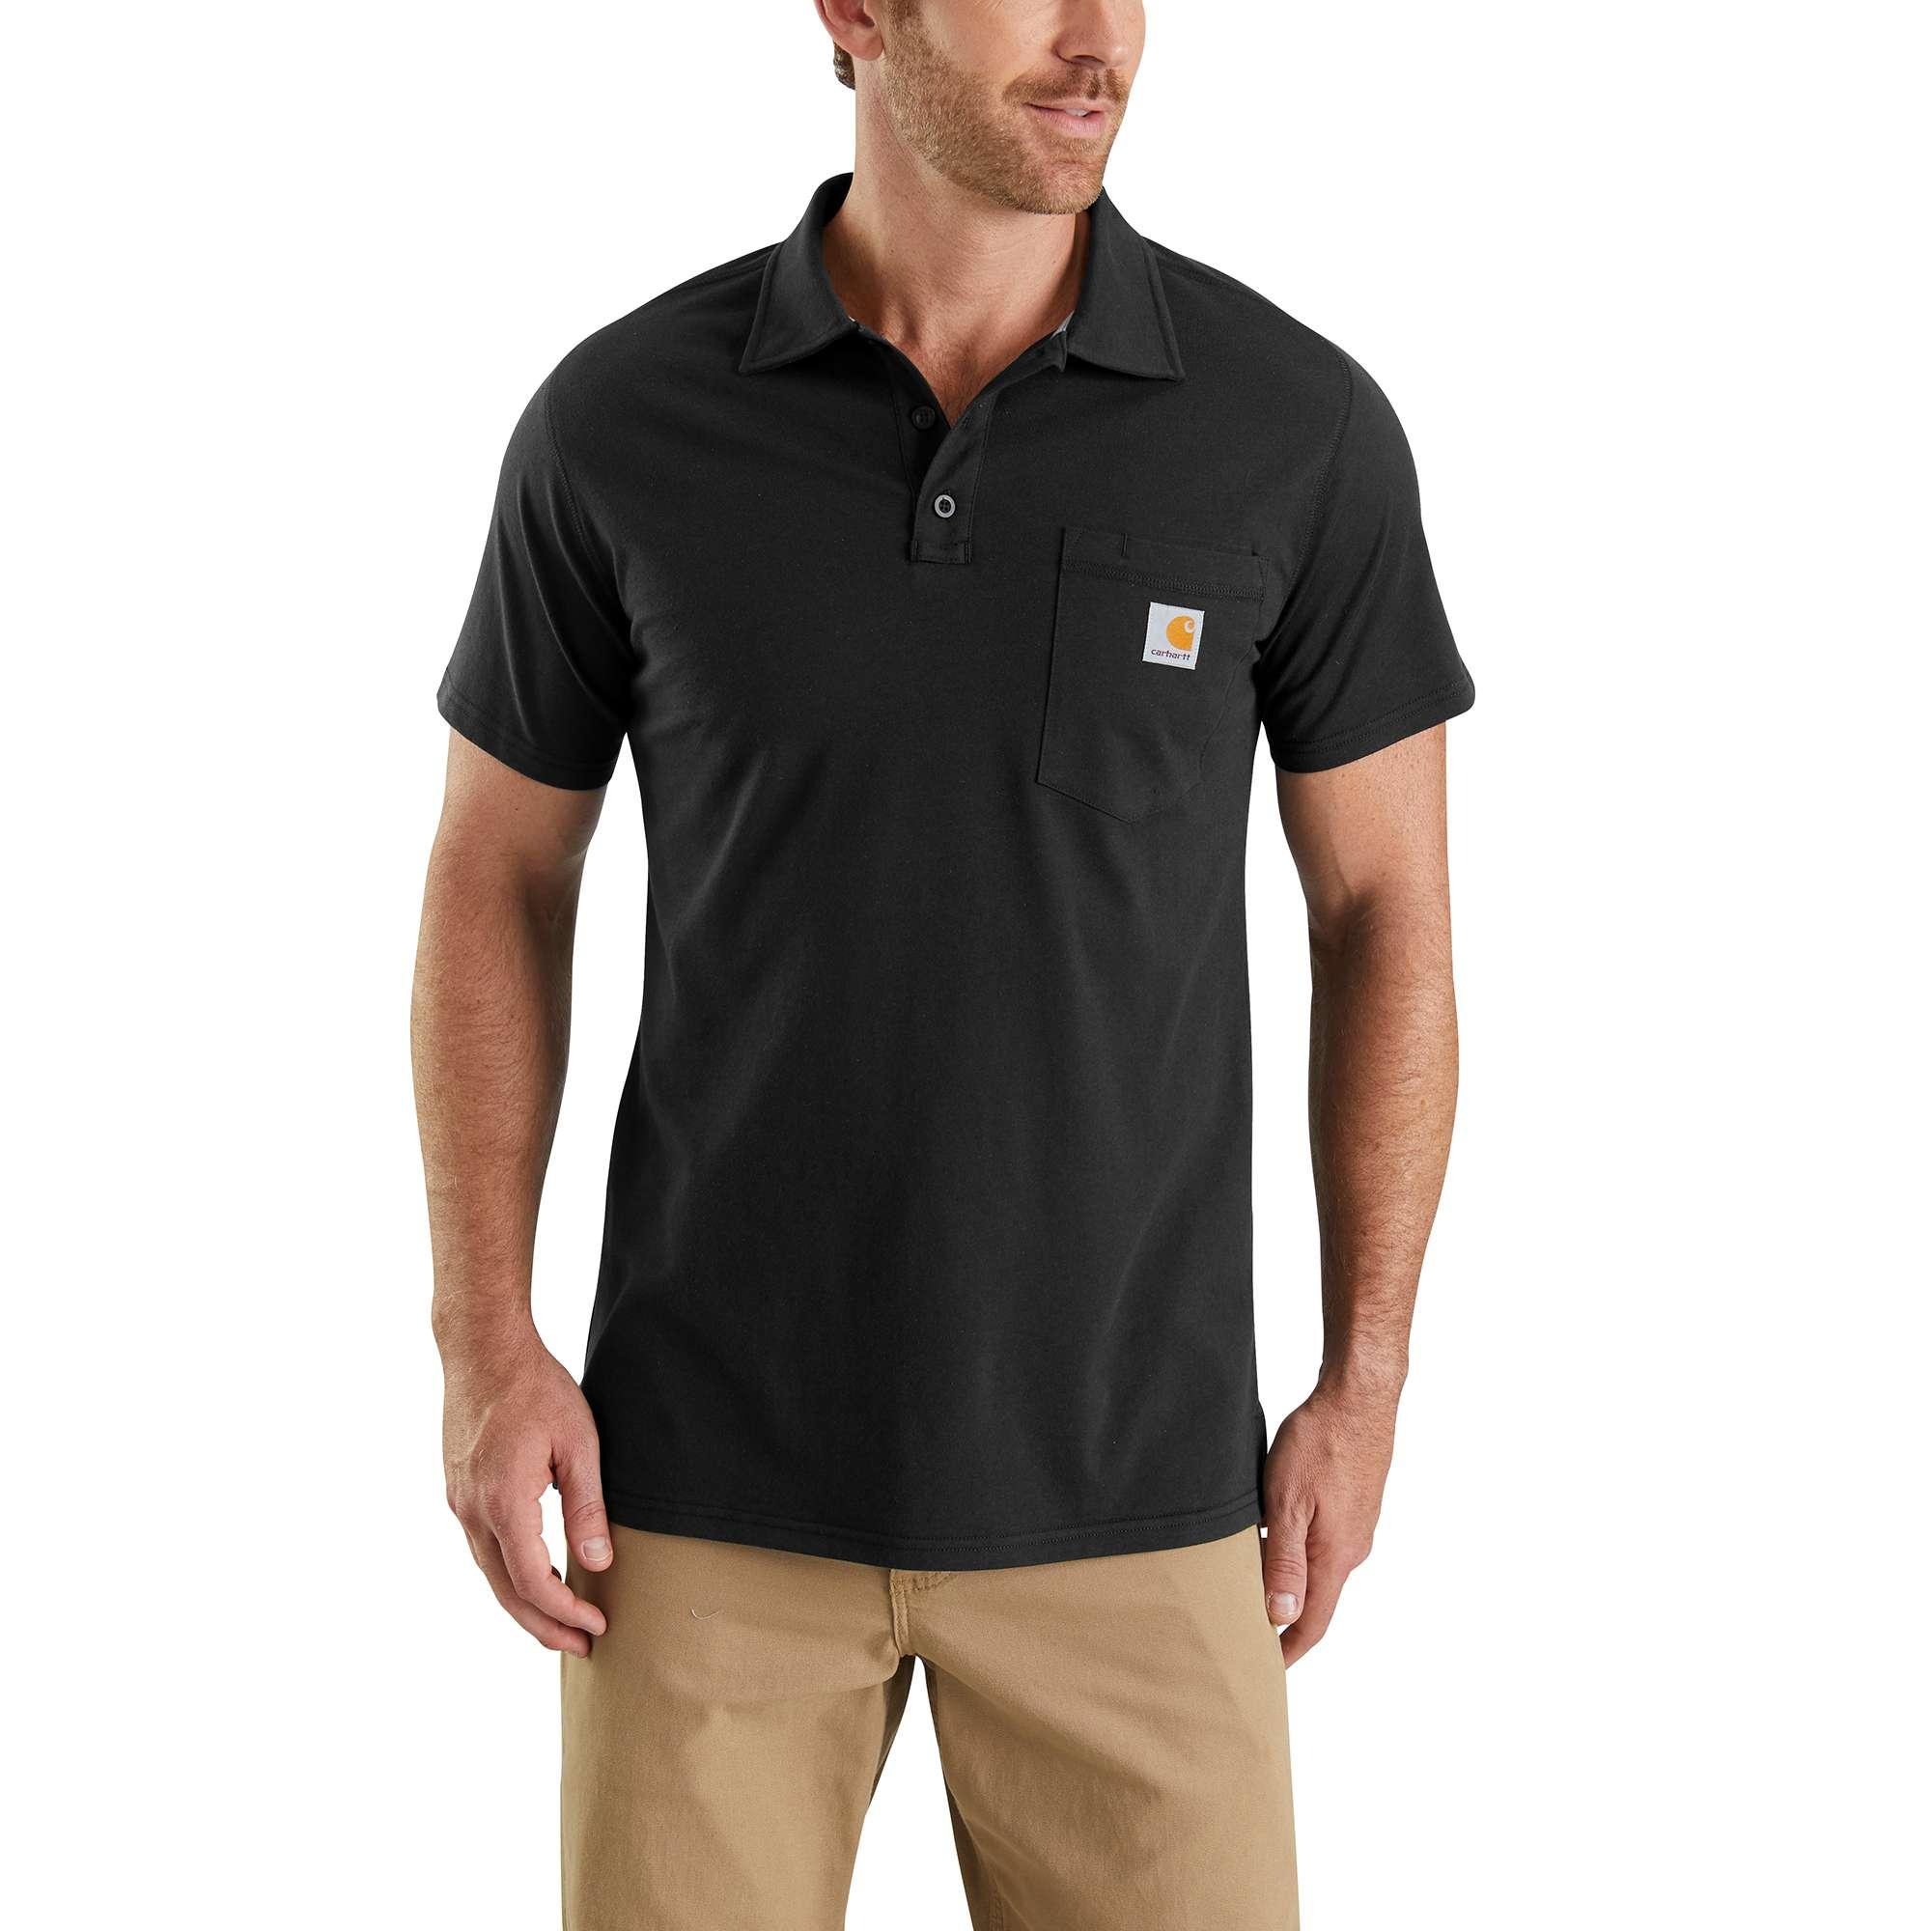 Men's Force Cotton Delmont Pocket Polo, Black, swatch